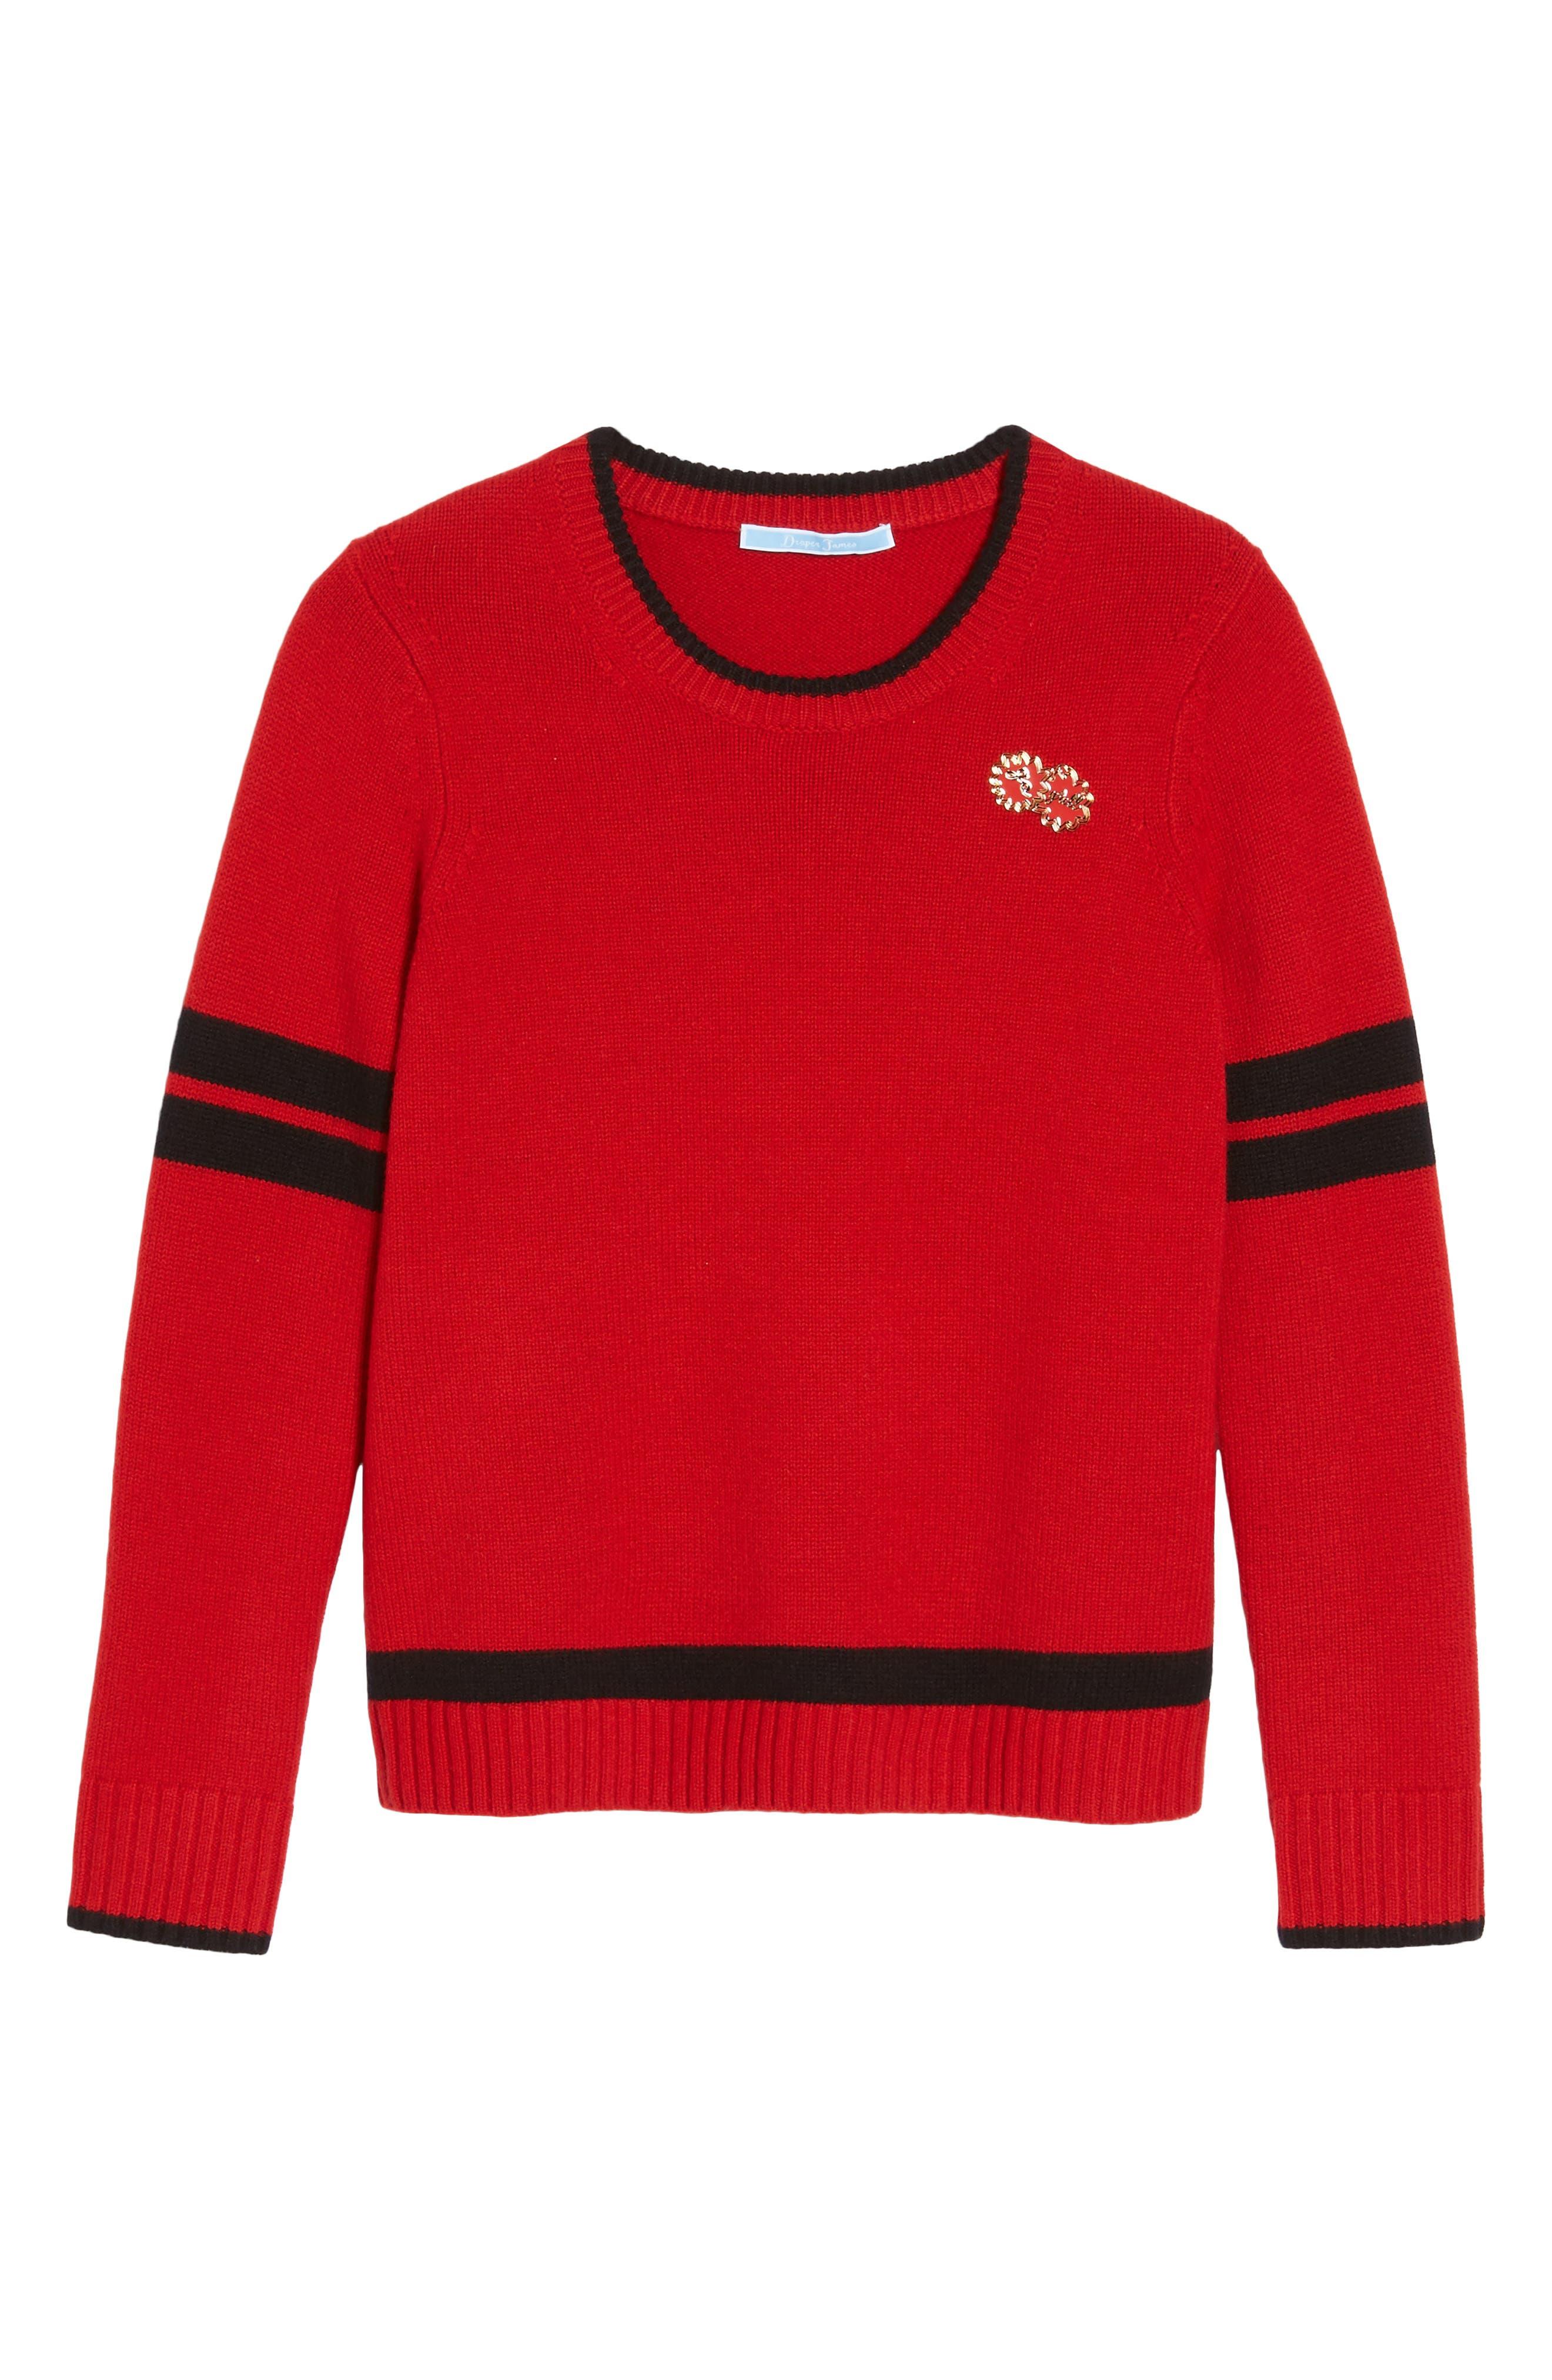 Spirit Sweater,                             Alternate thumbnail 6, color,                             006